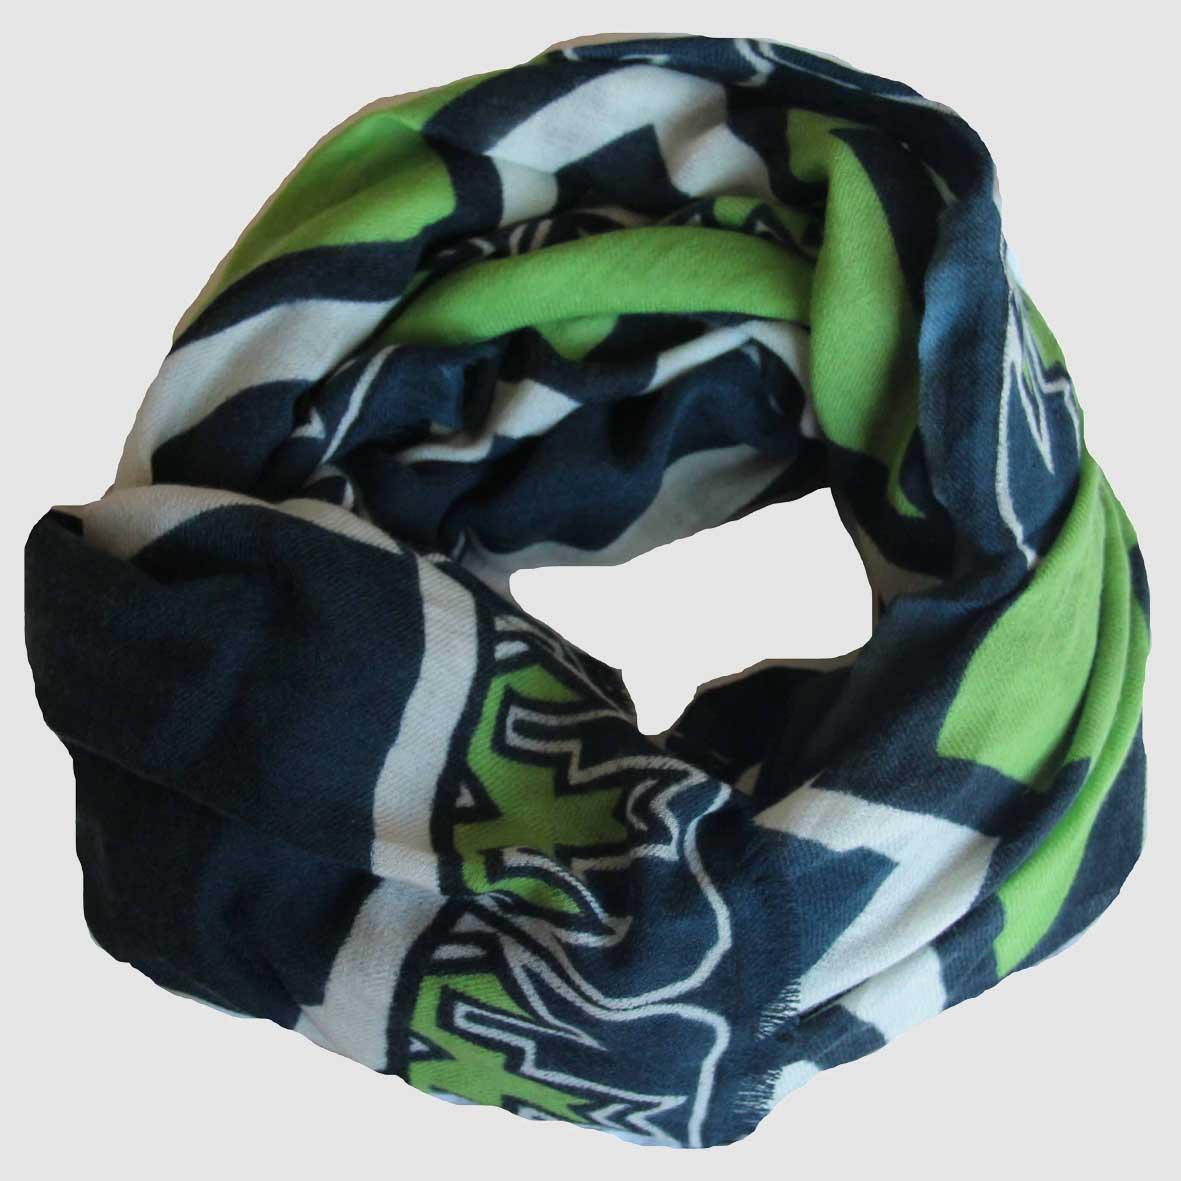 Echarpe XL Ndebele - Vert